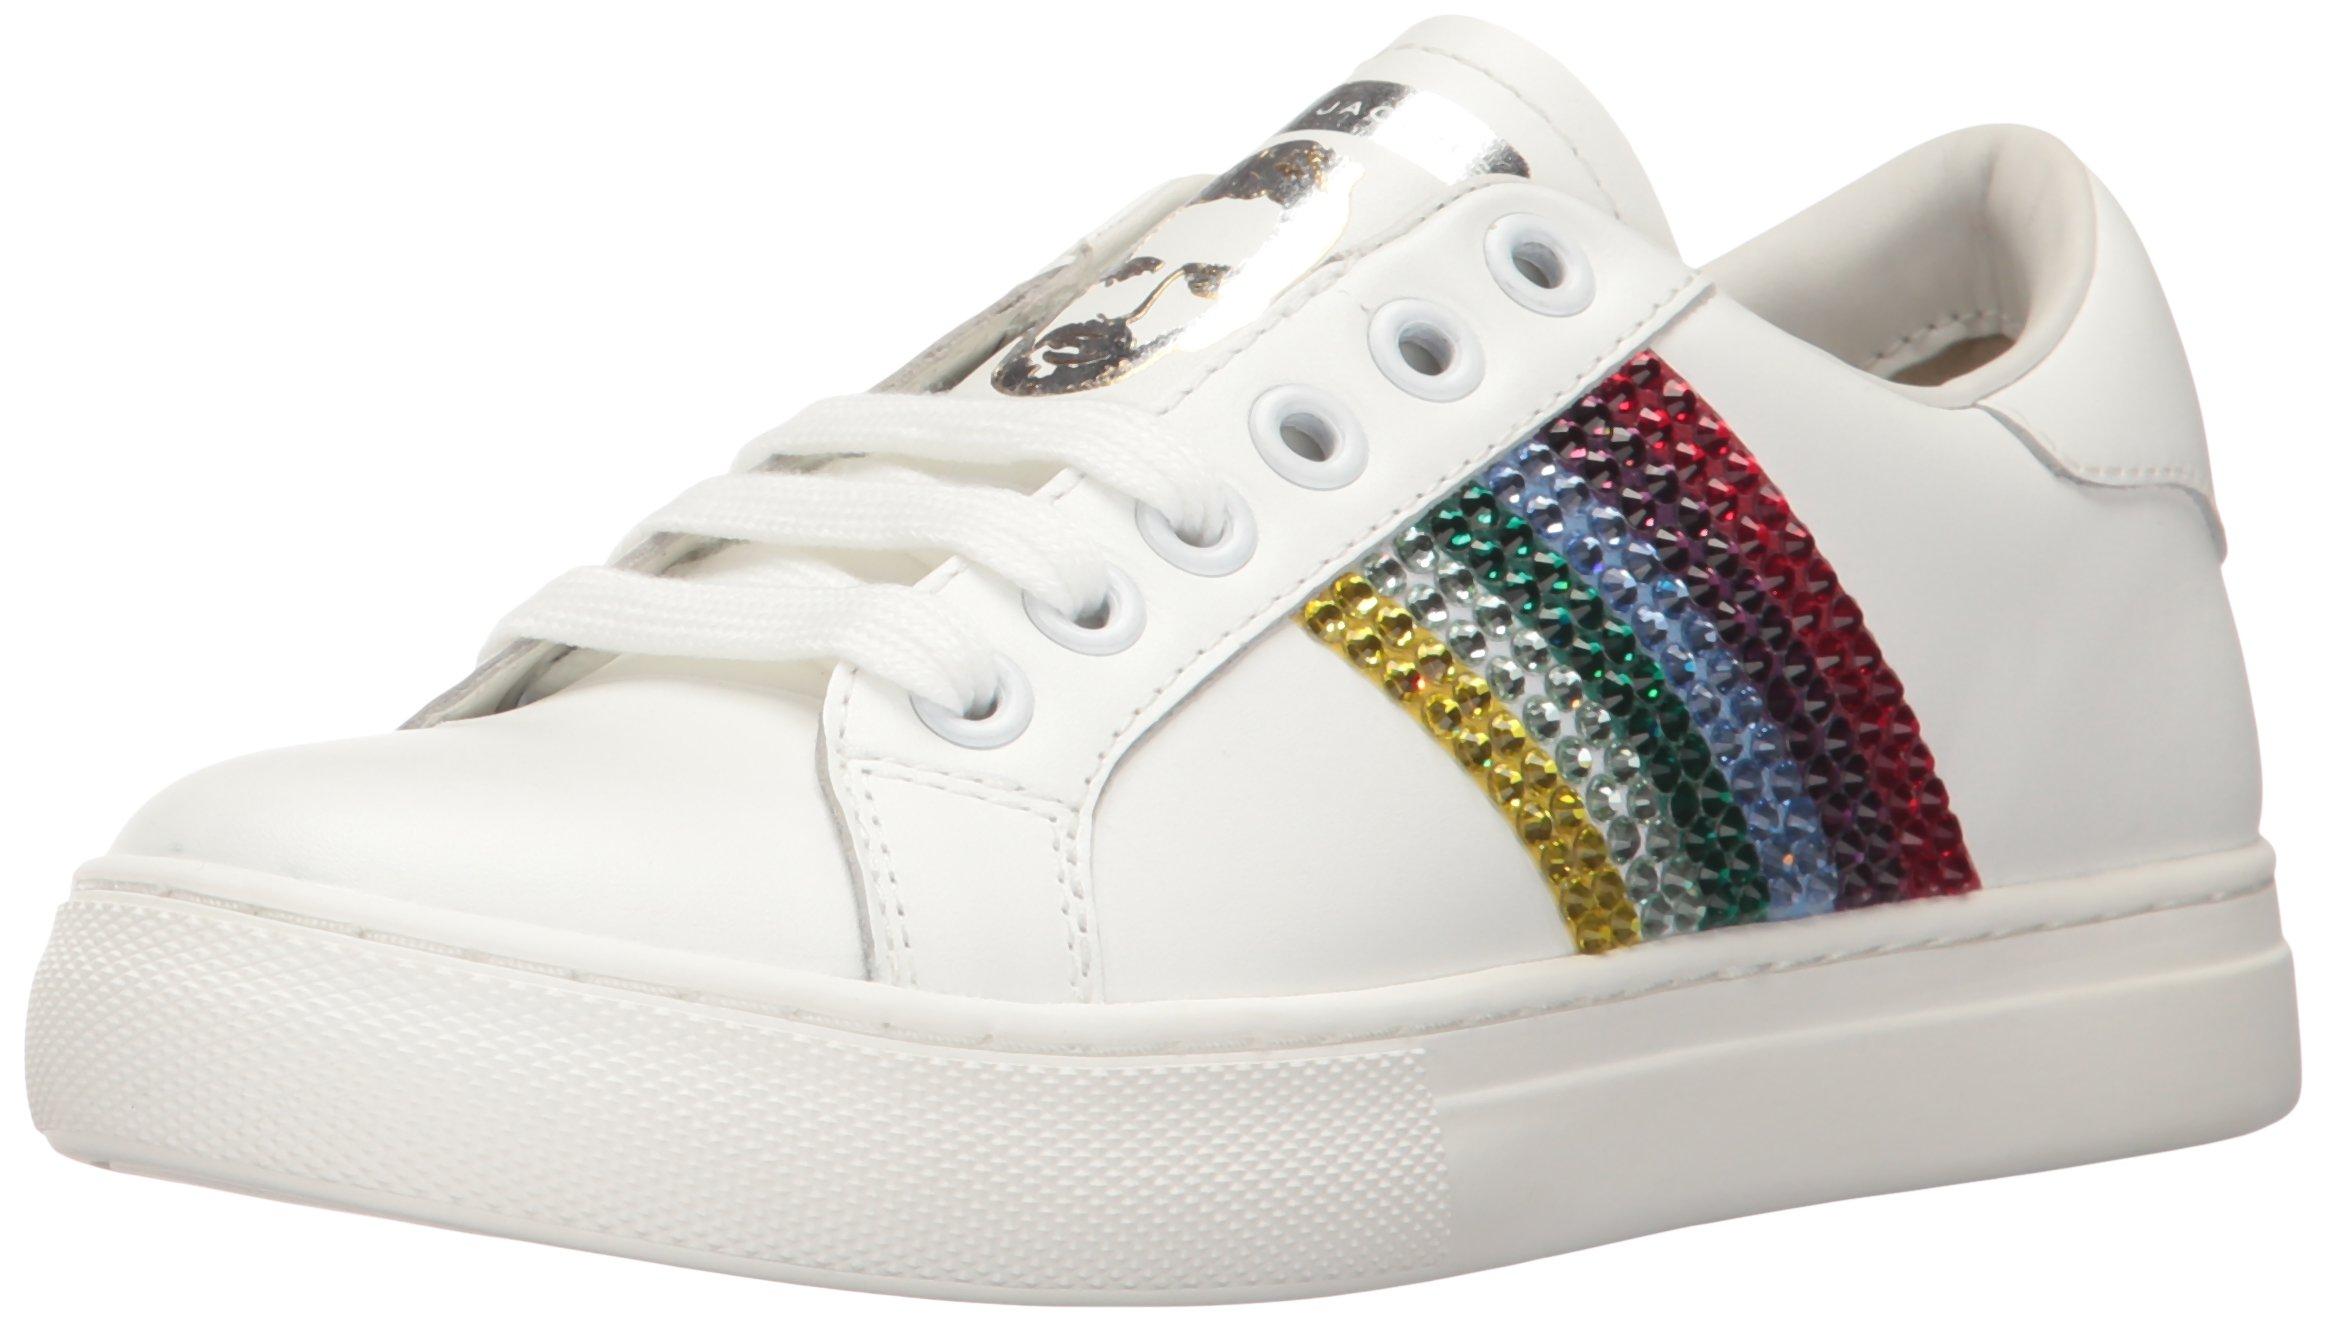 Marc Jacobs Women's Empire Strass Low Top Sneaker, White/Multi, 37 M EU (7 US)